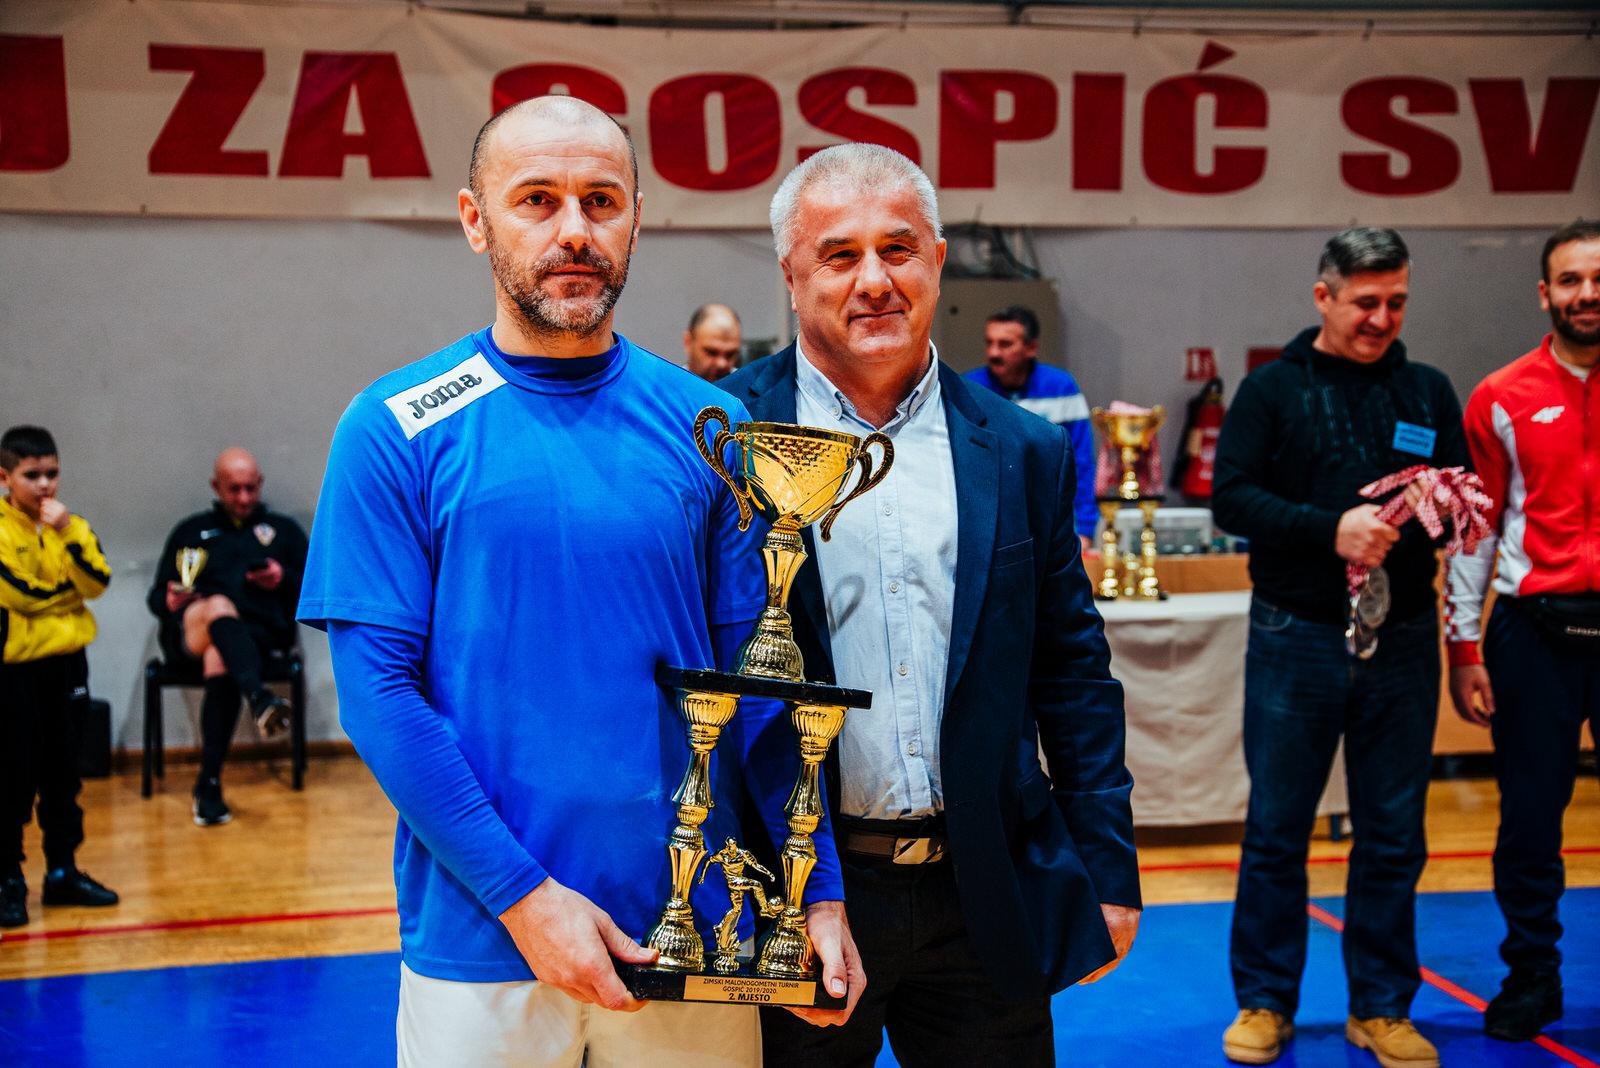 likaclub_zimska-malonogometna-liga-gospić_2019-20-135